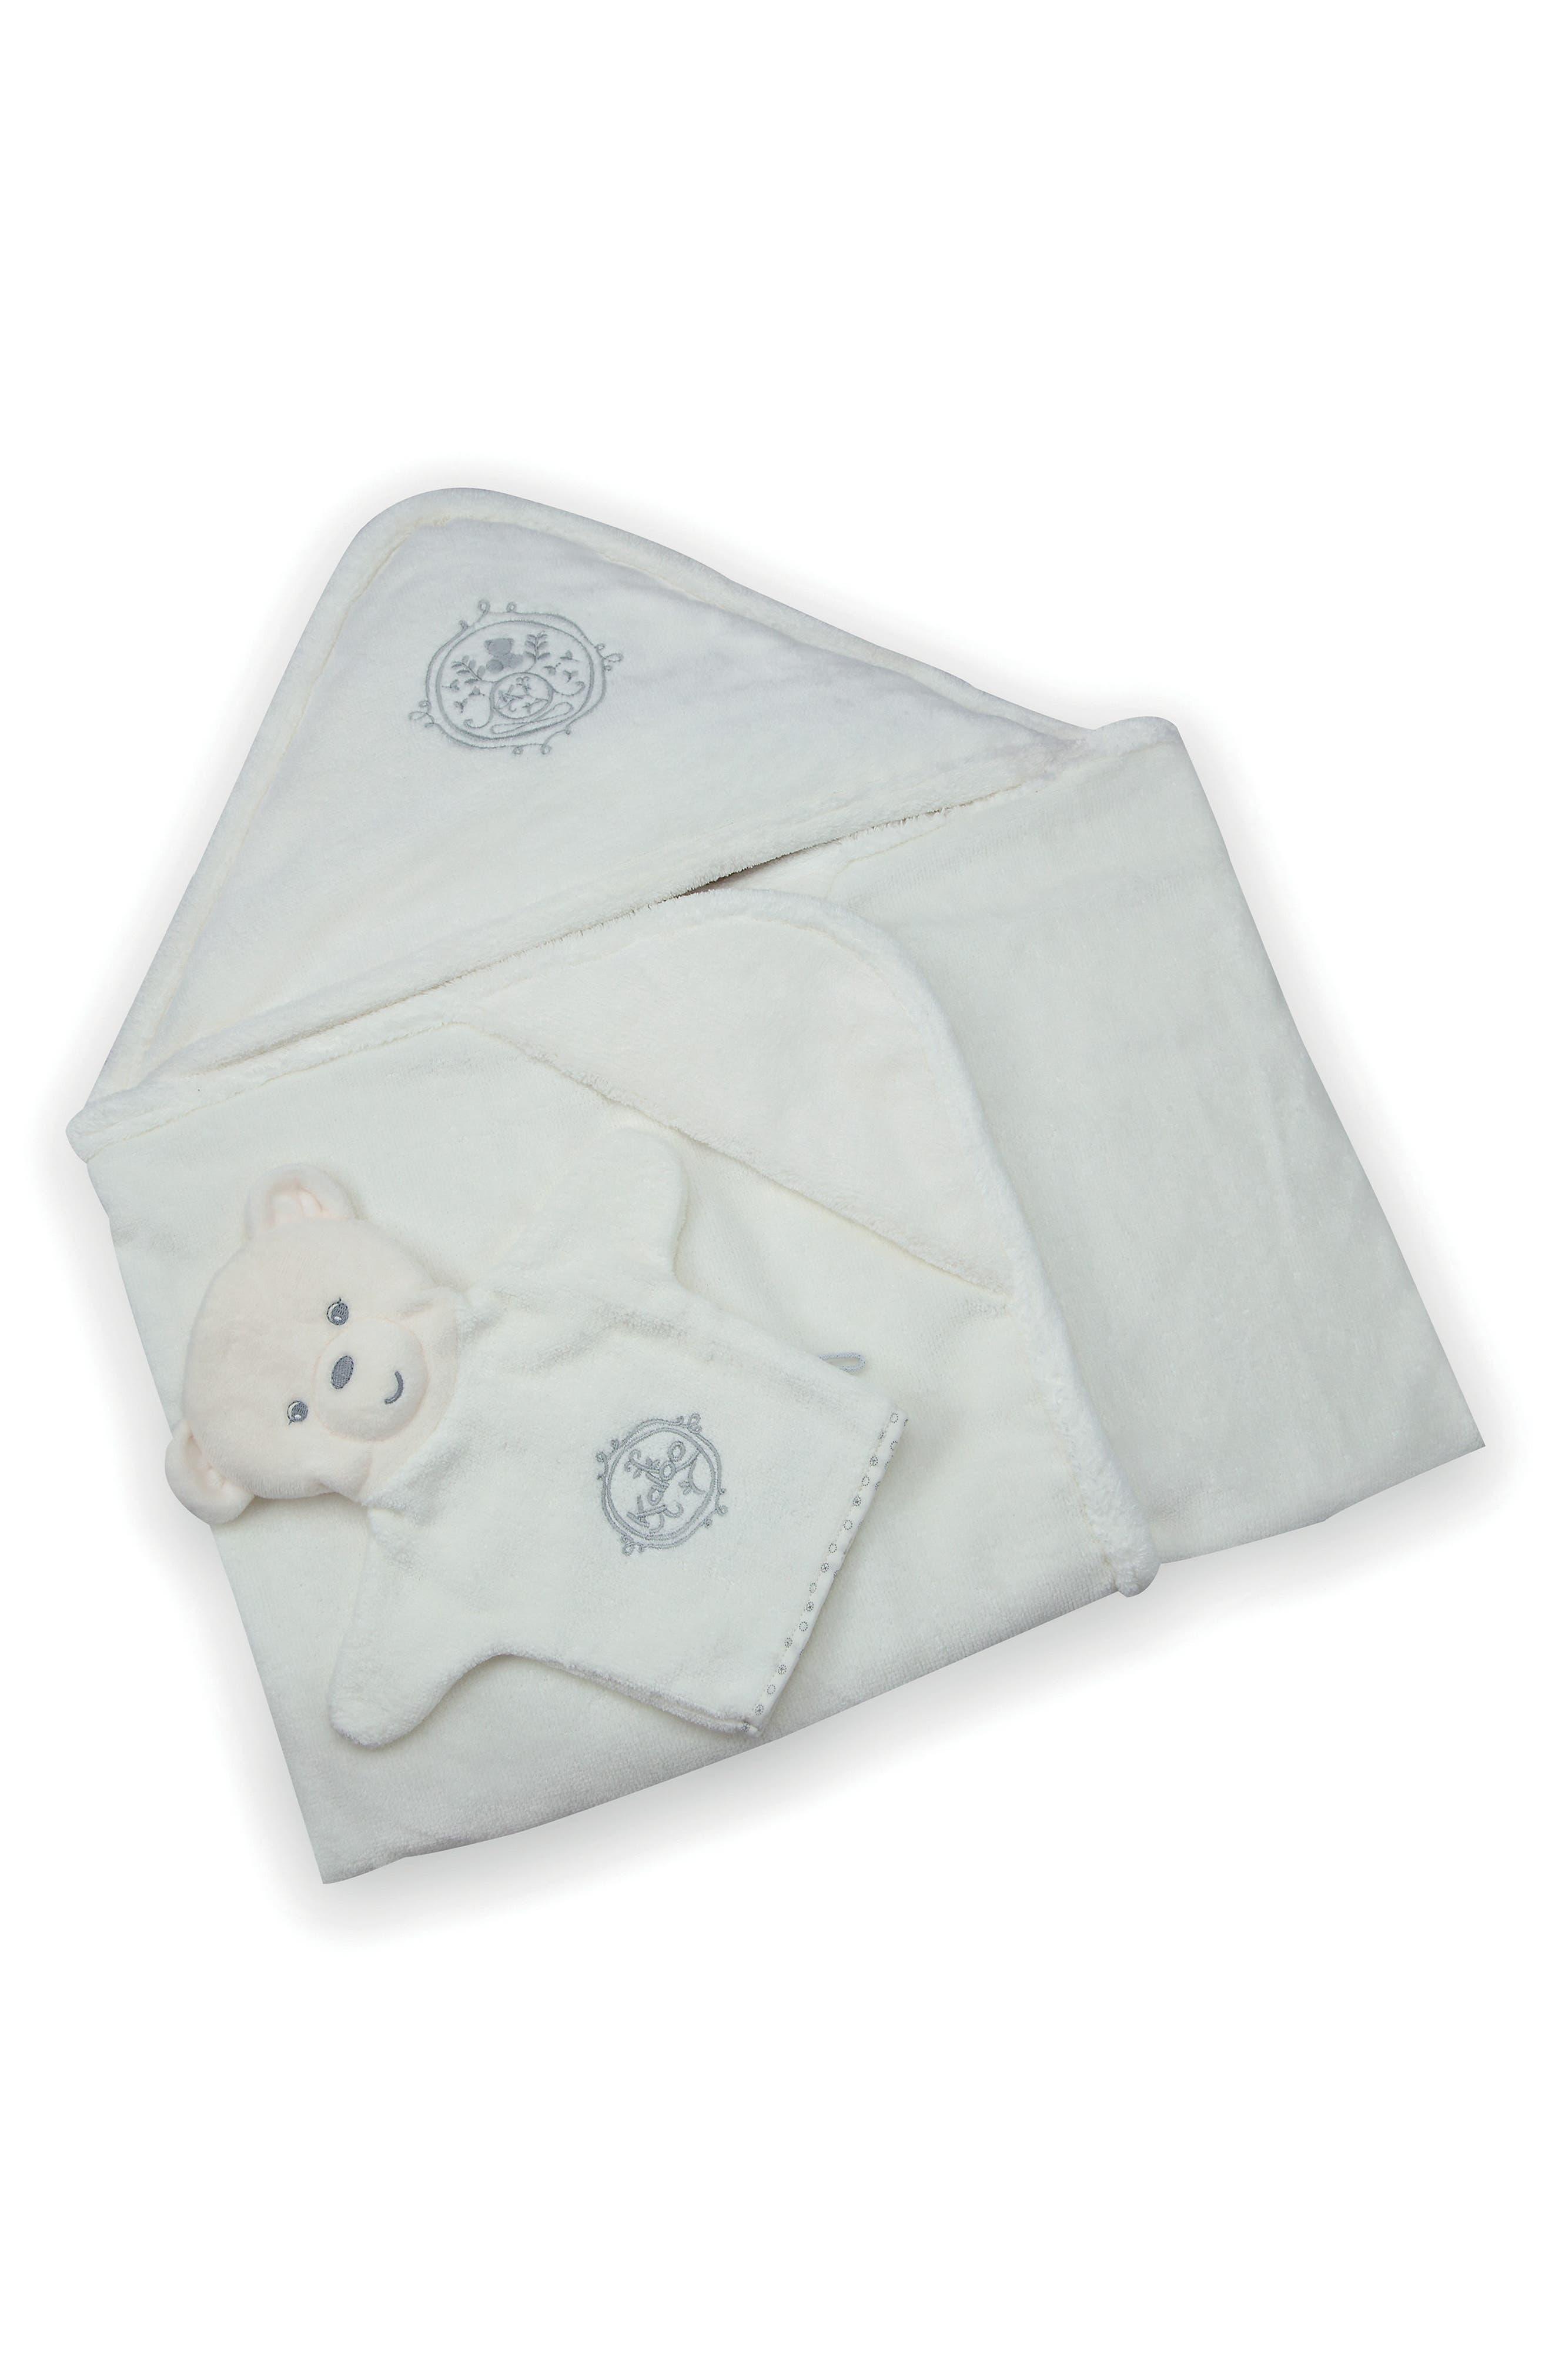 Main Image - Kaloo Bath Towel & Bear Puppet Wash Mitt